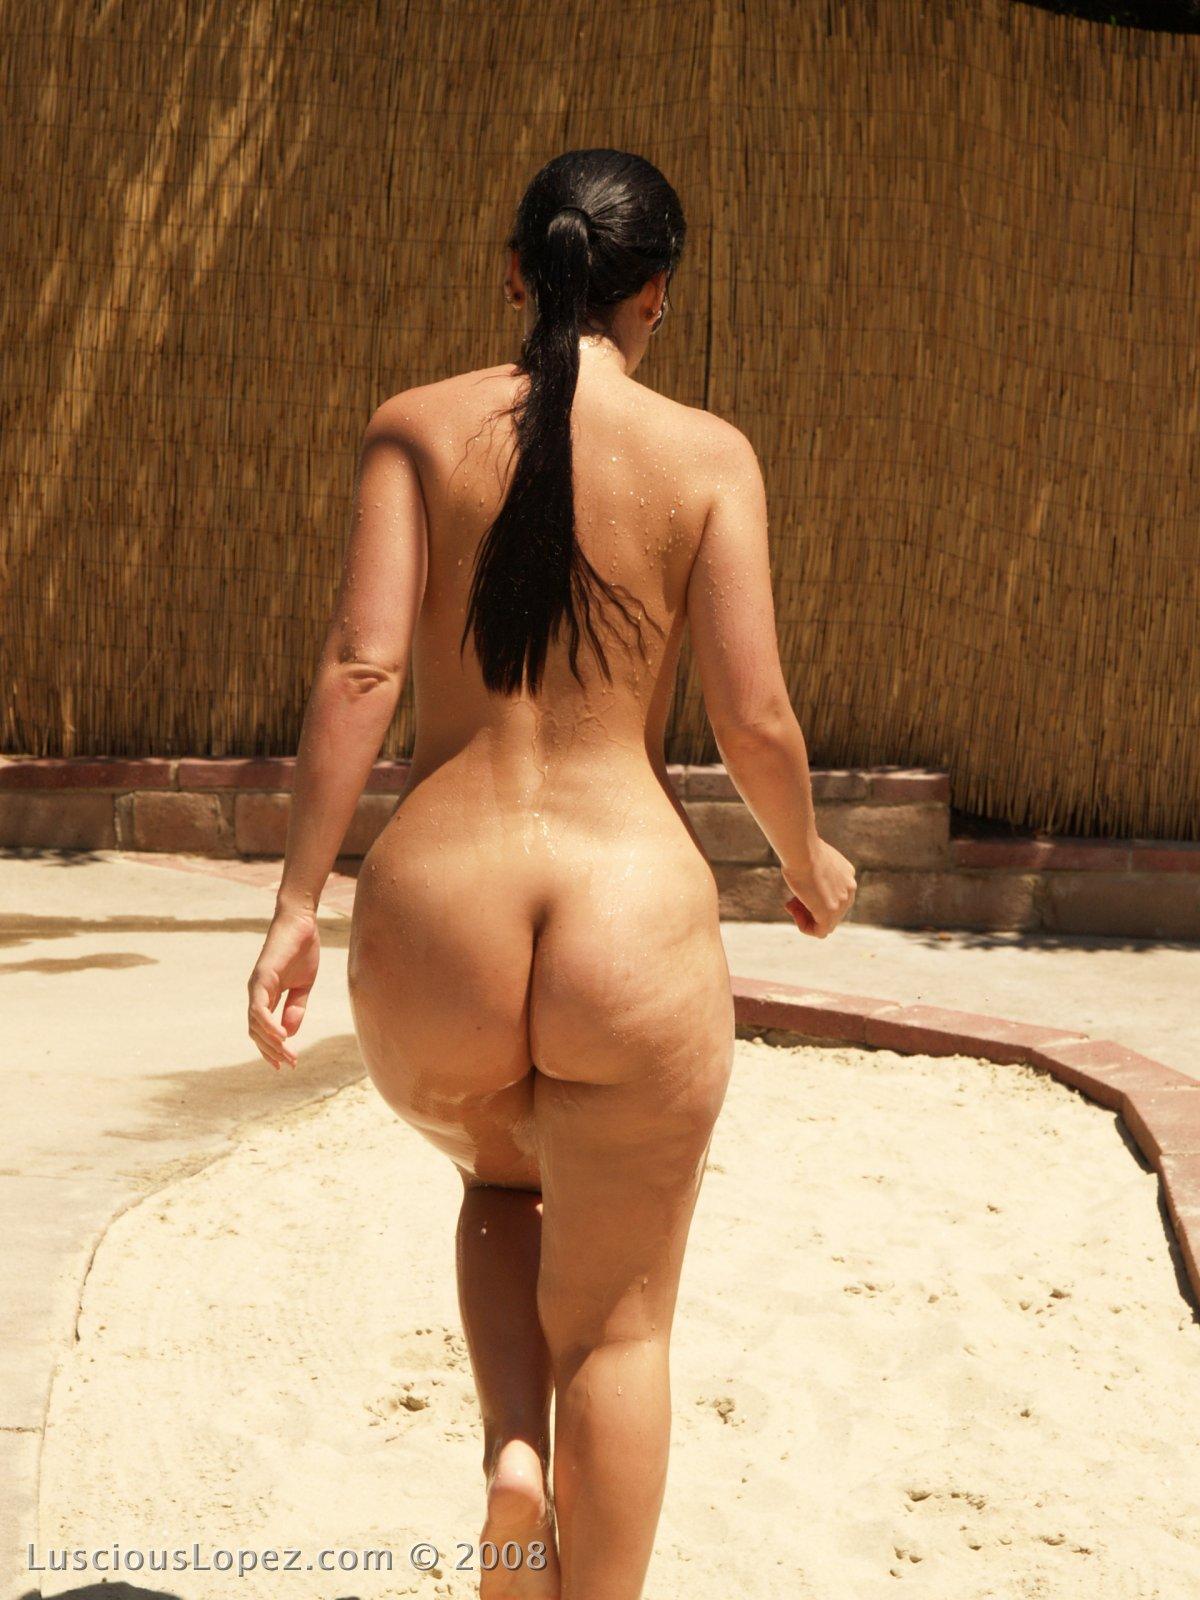 Luscious Lopez Booty - Hot Girls Wallpaper